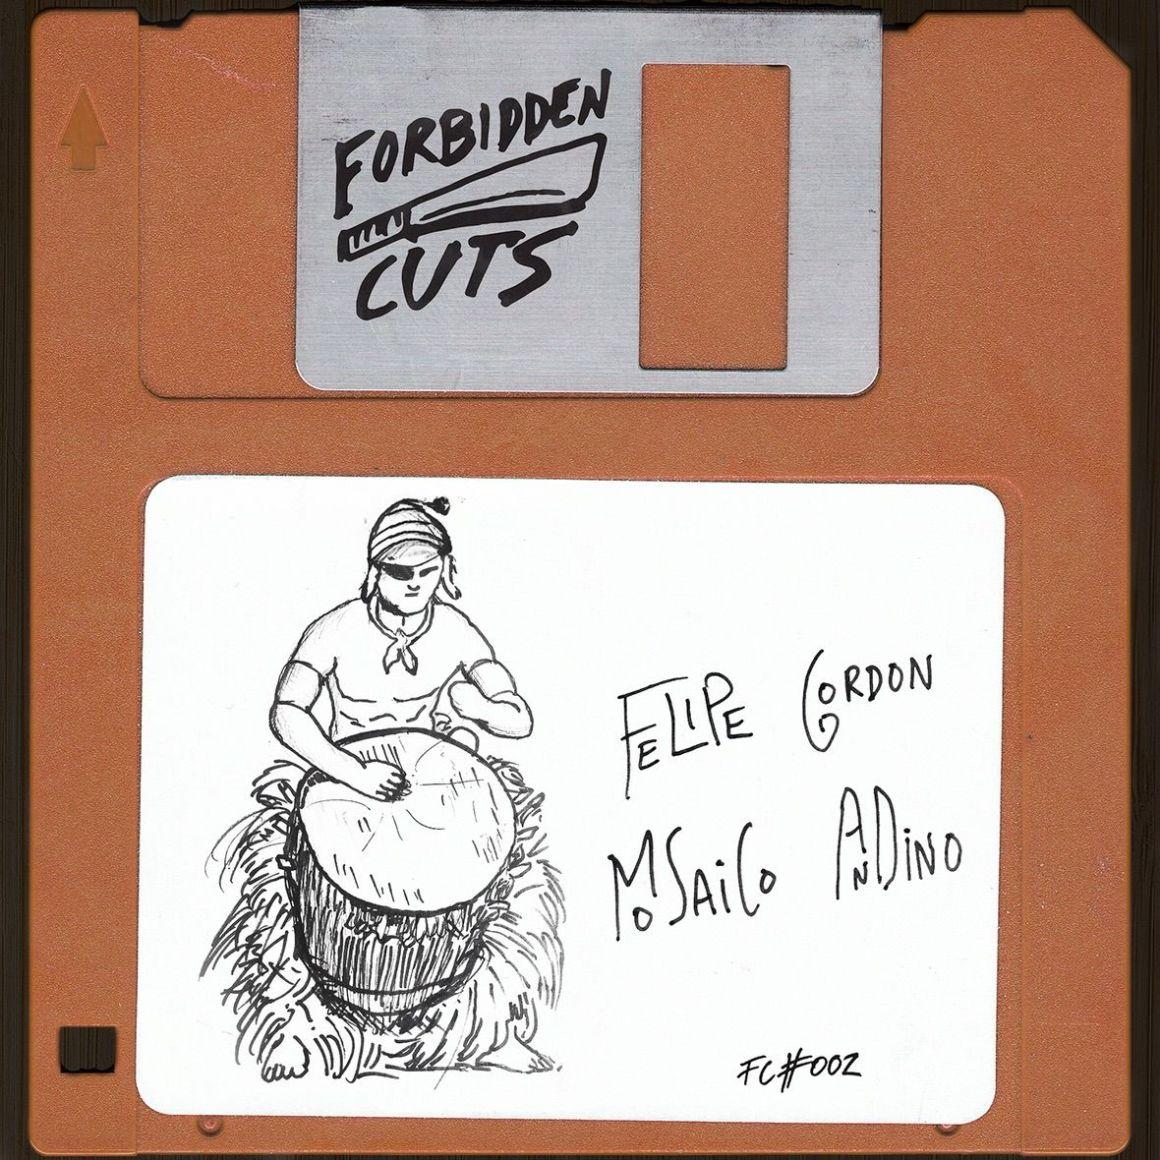 Felipe Gordon - Mosaico Andino (Forbidden Cuts) // House